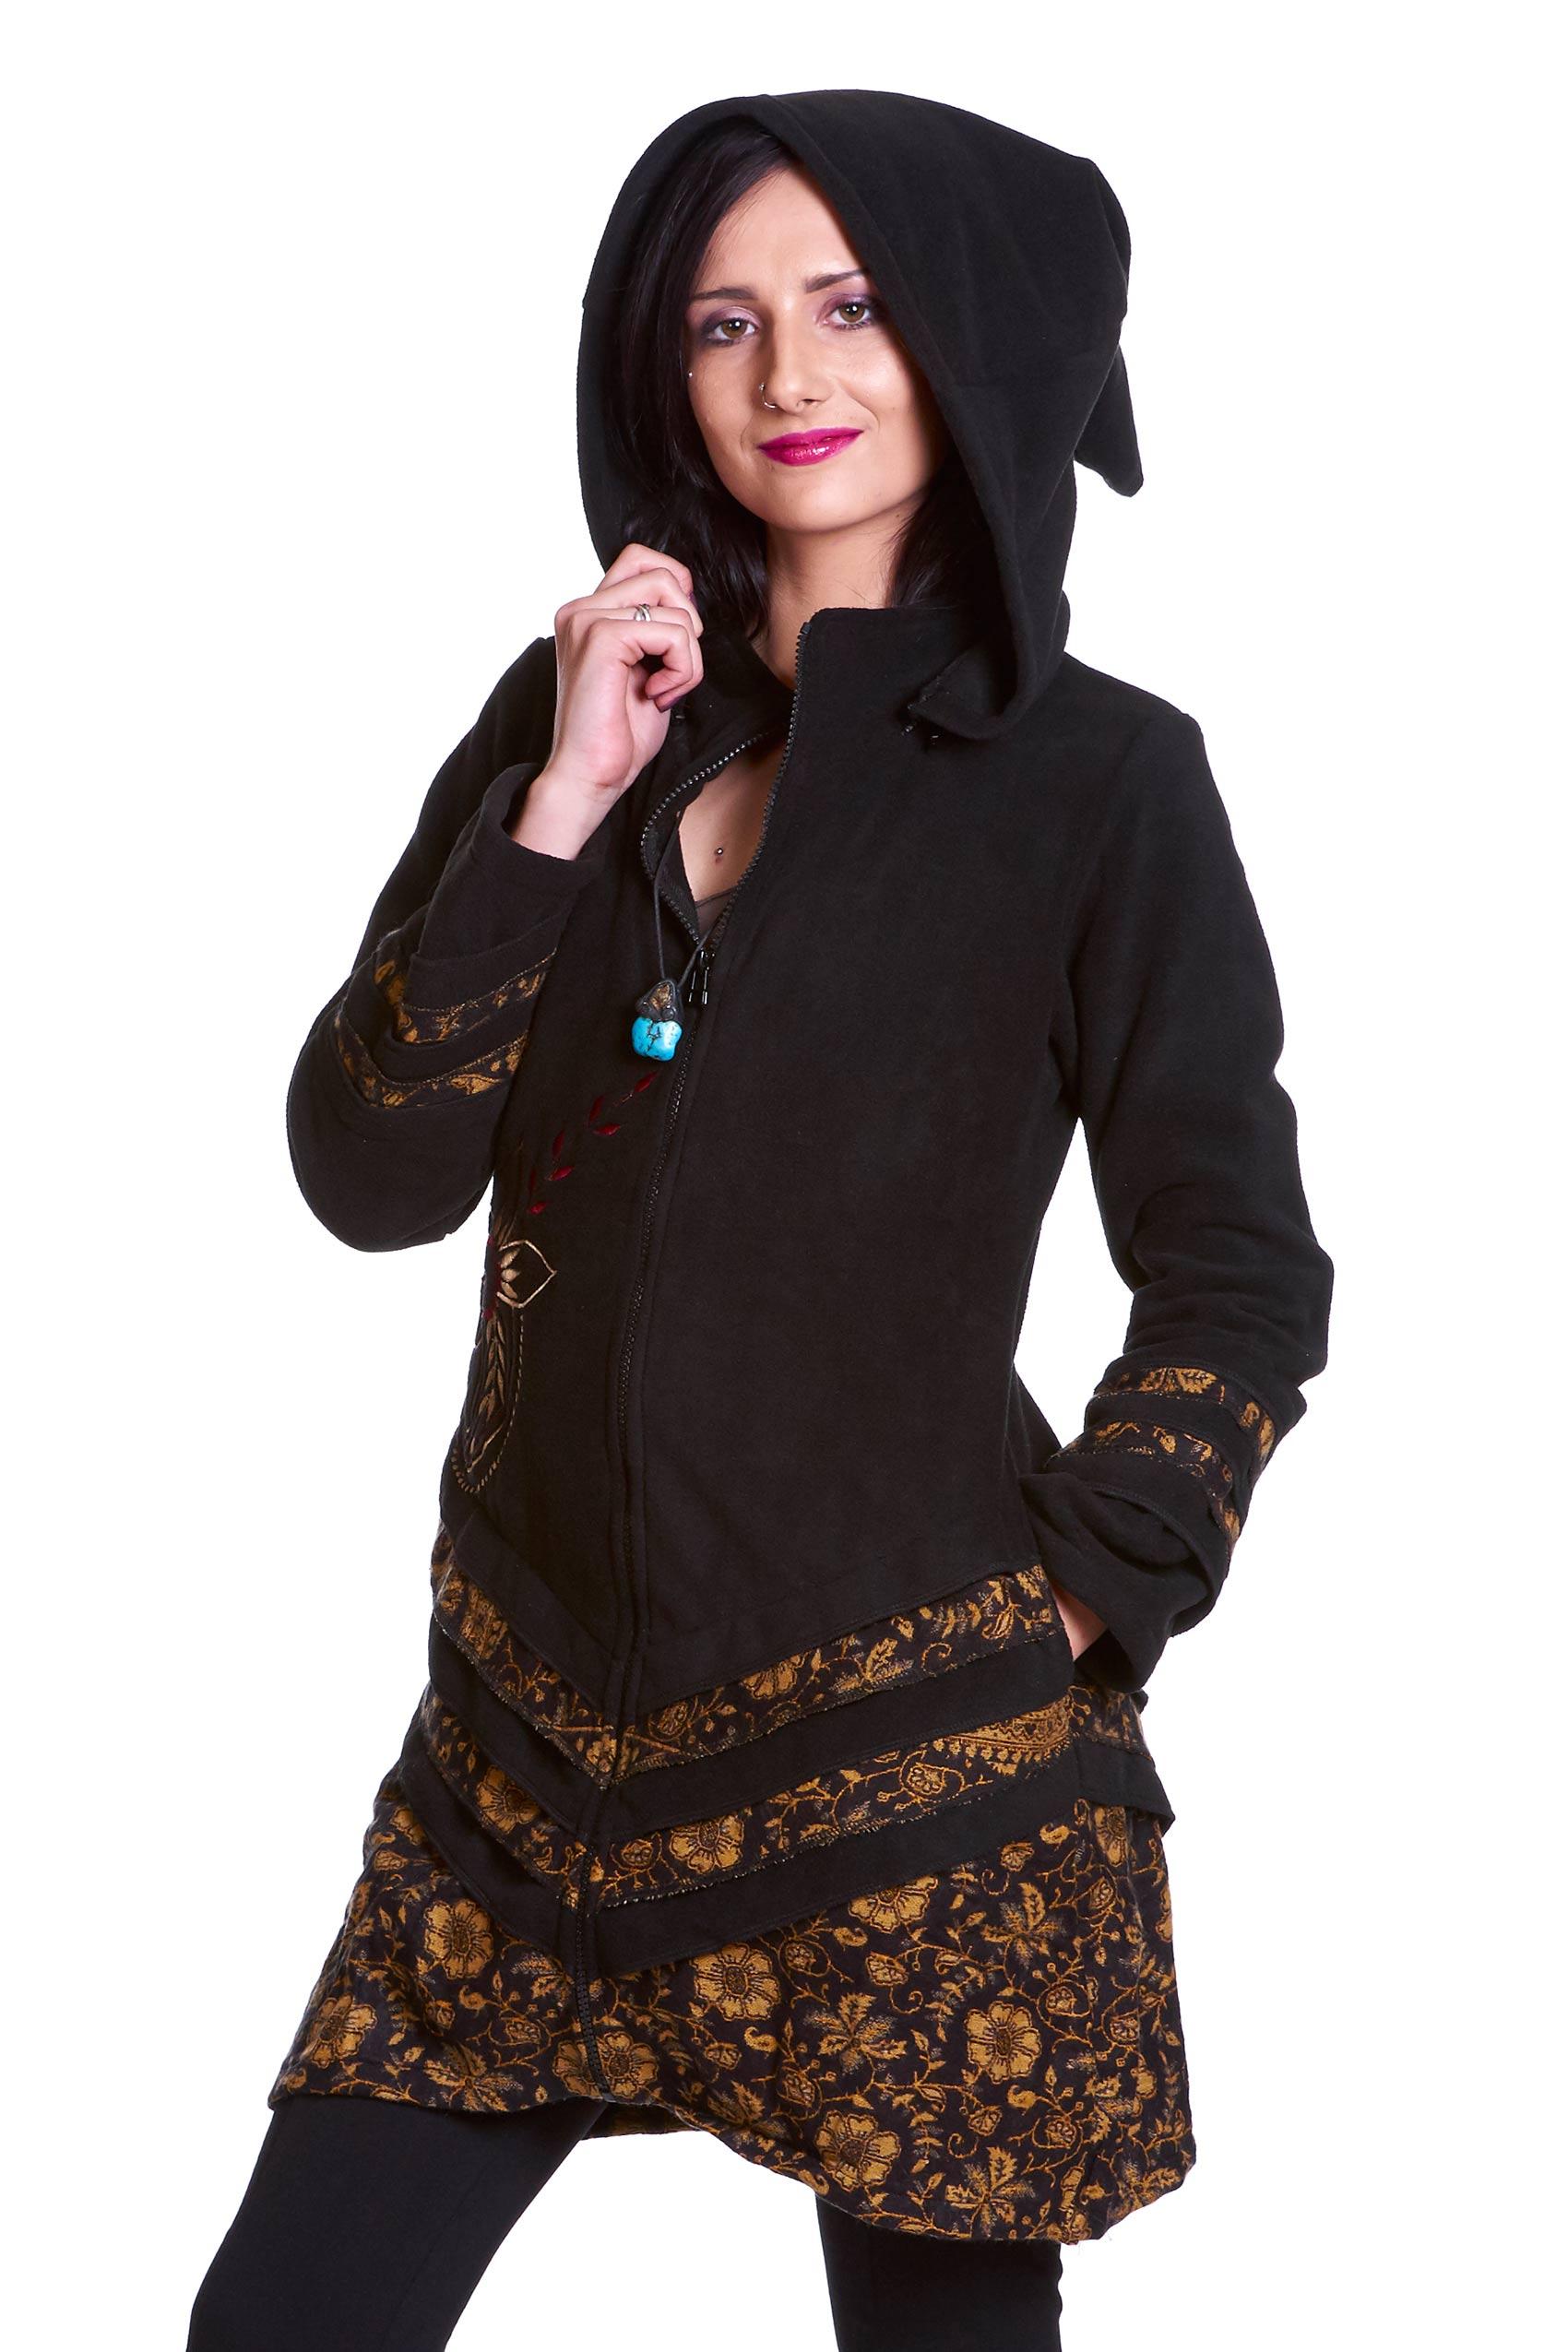 boho pixie fleece coat pixie hood jacket psy trance coat altshop uk. Black Bedroom Furniture Sets. Home Design Ideas